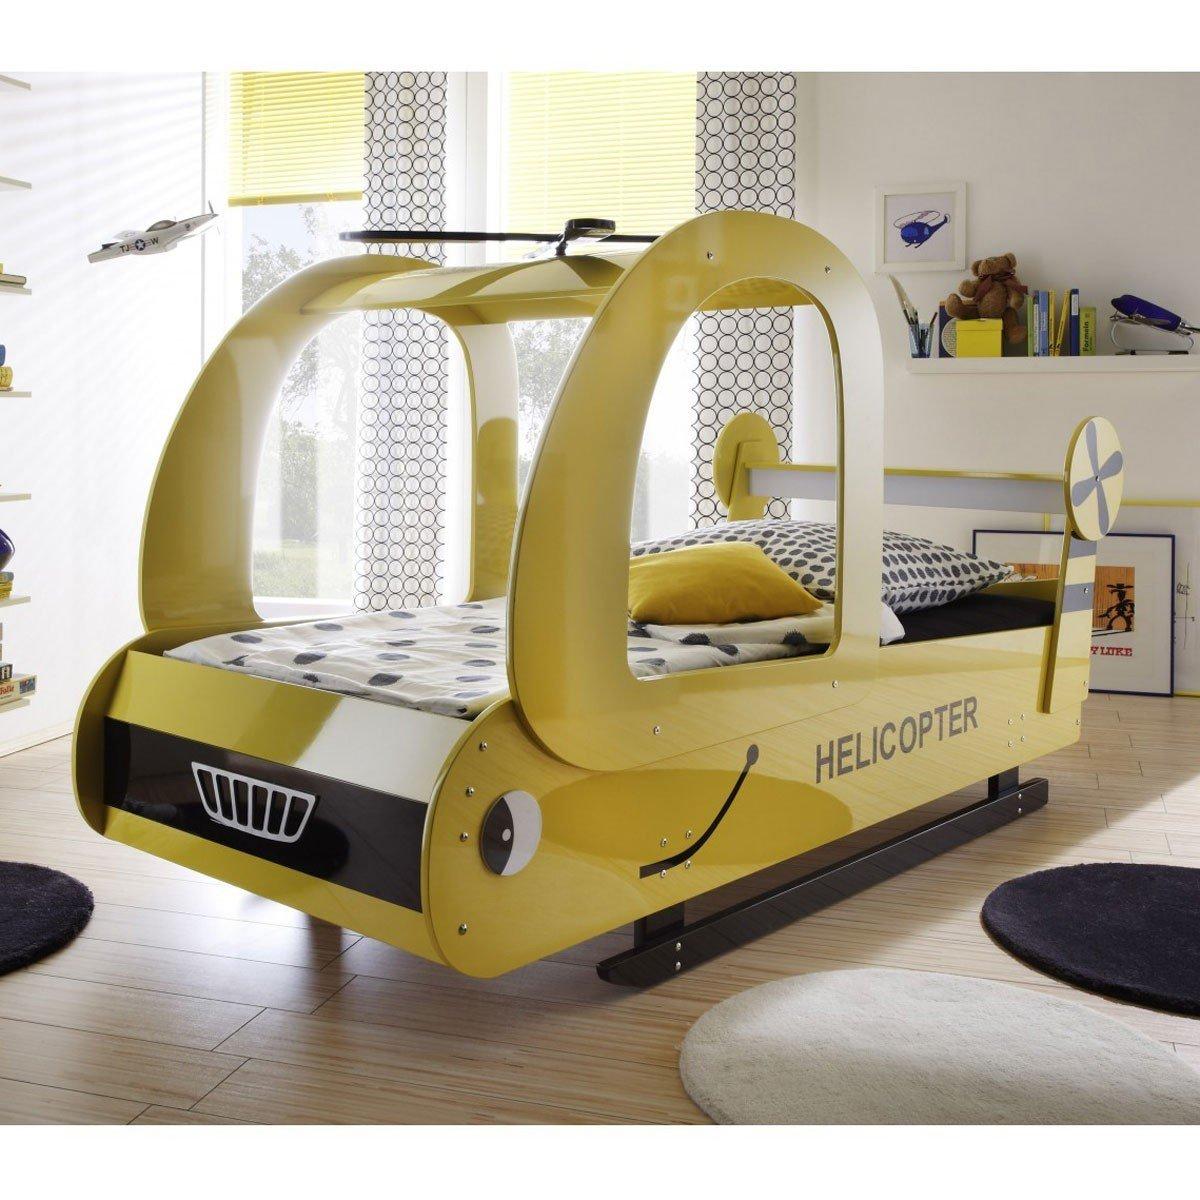 Kinderbett hubschrauber  Kinderbett